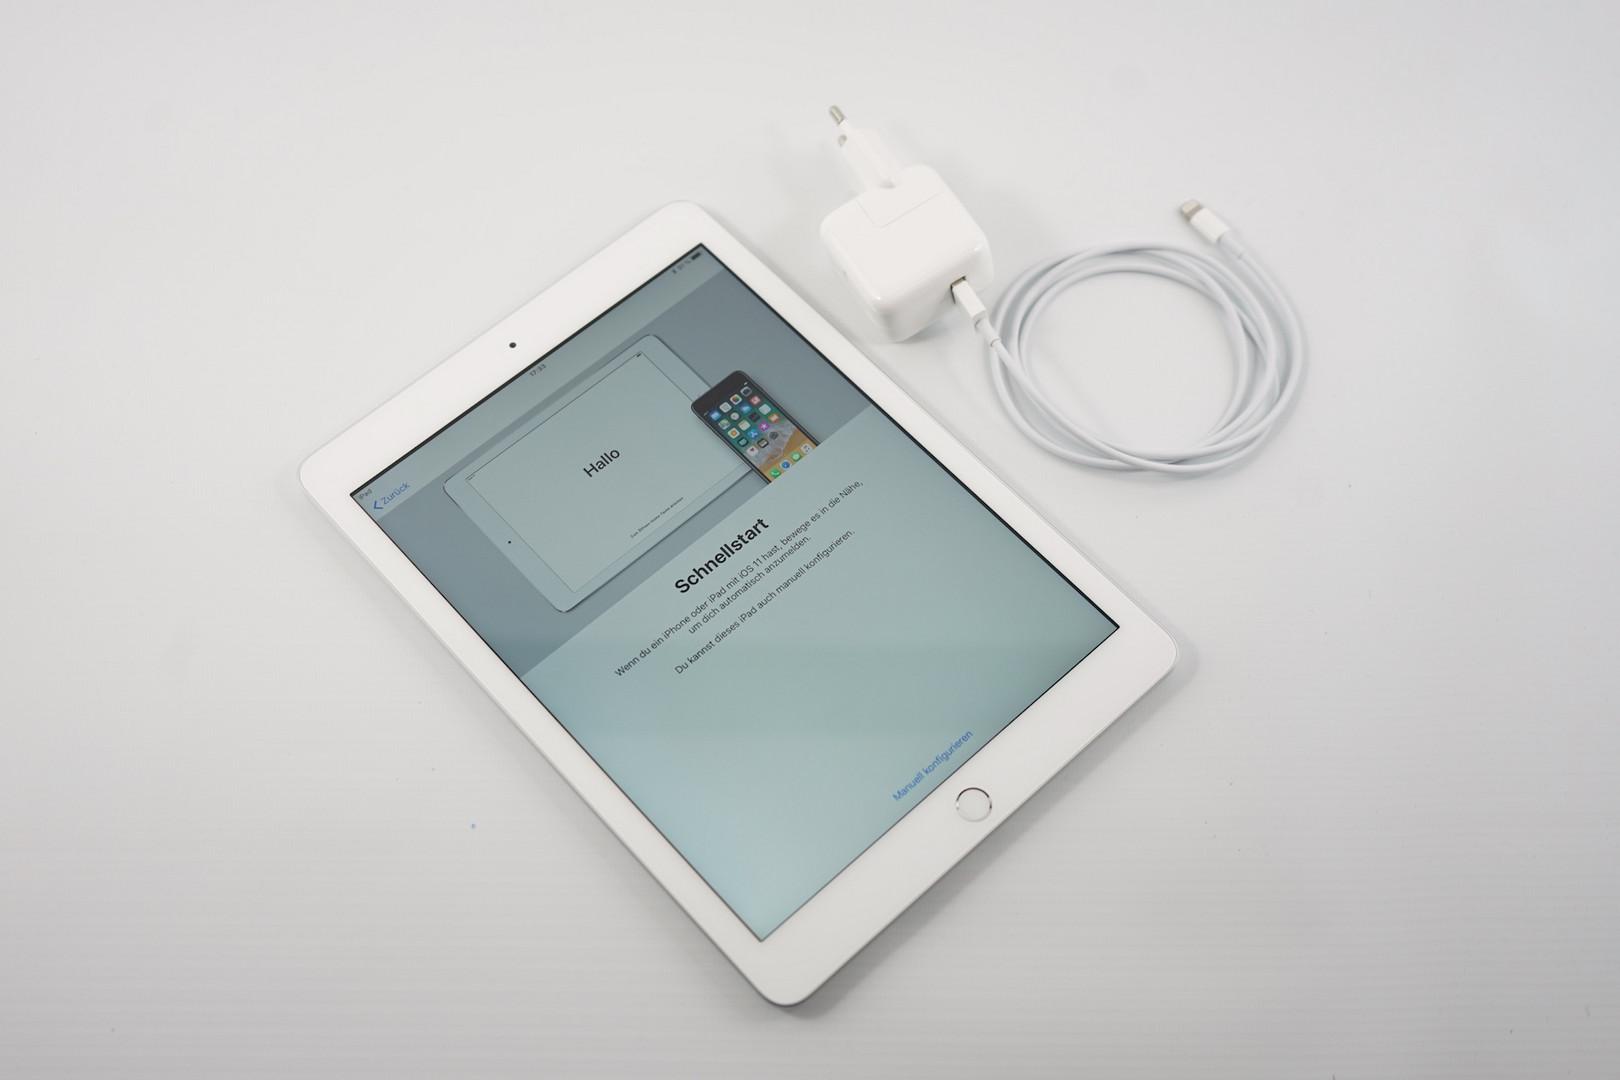 apple ipad 6 2018 tablet review reviews. Black Bedroom Furniture Sets. Home Design Ideas